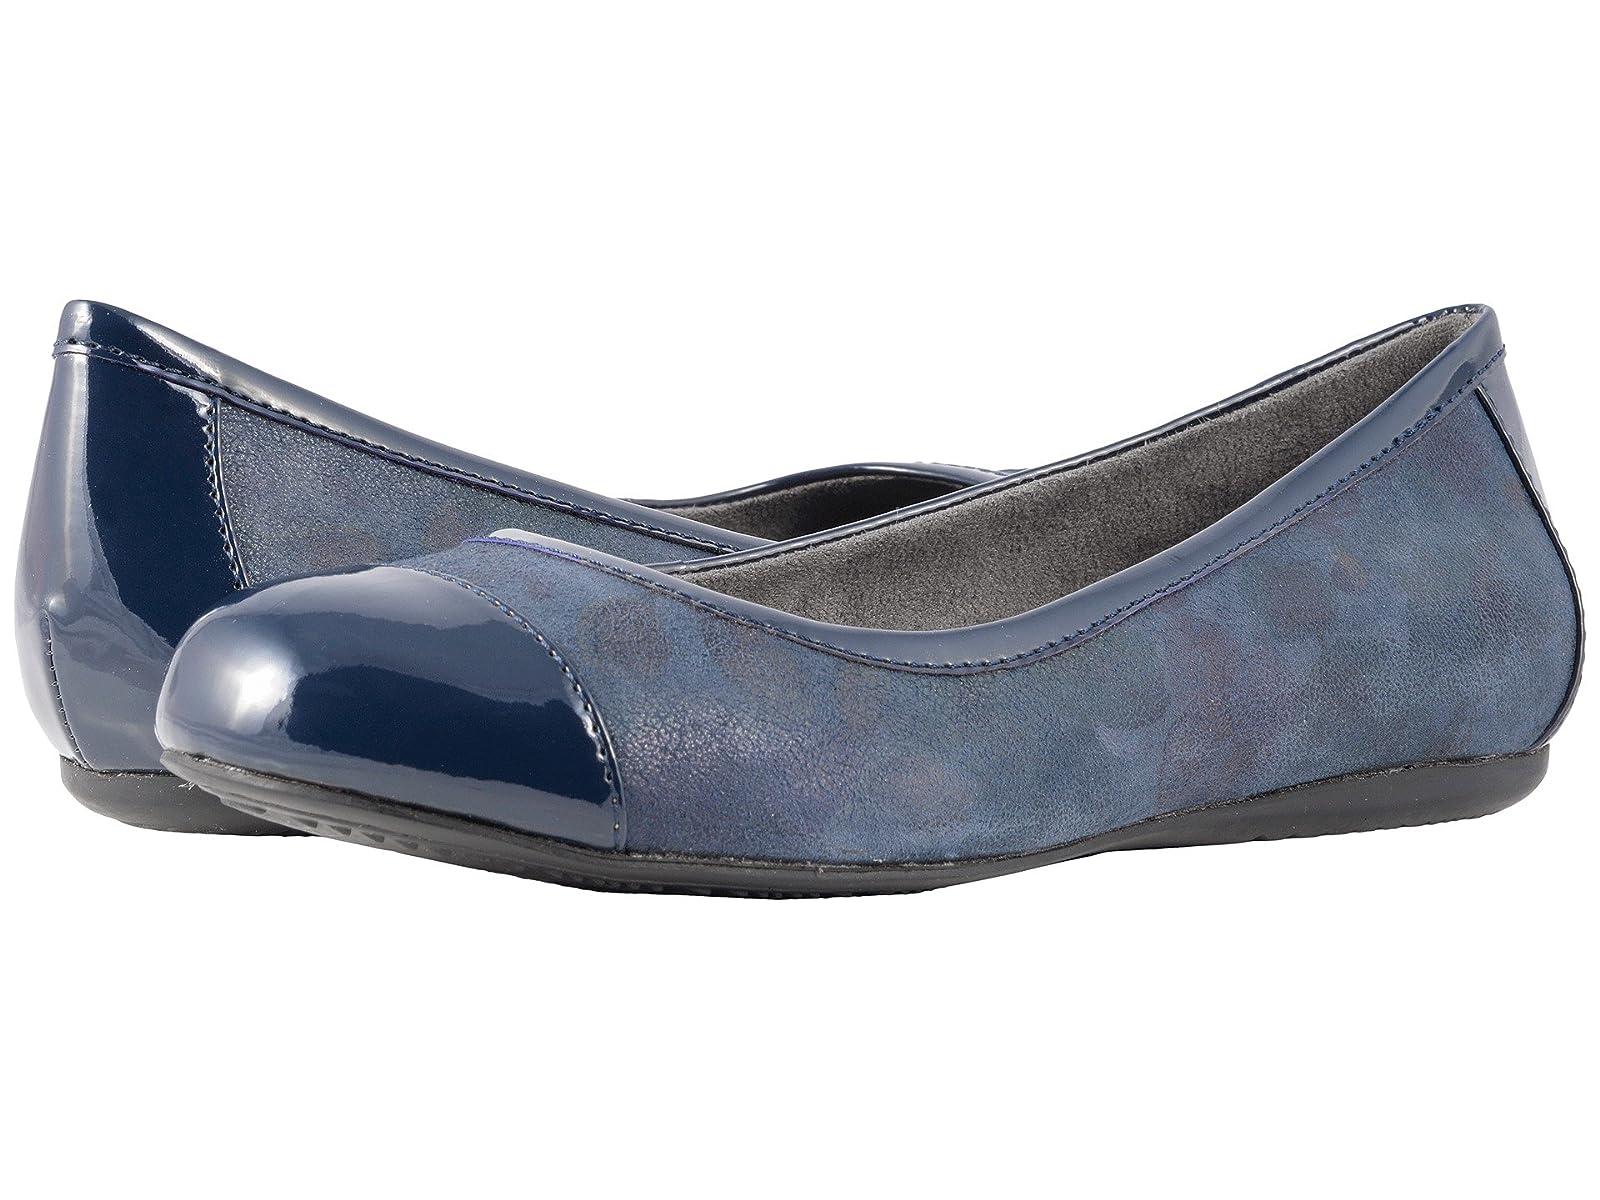 SoftWalk NapaAtmospheric grades have affordable shoes